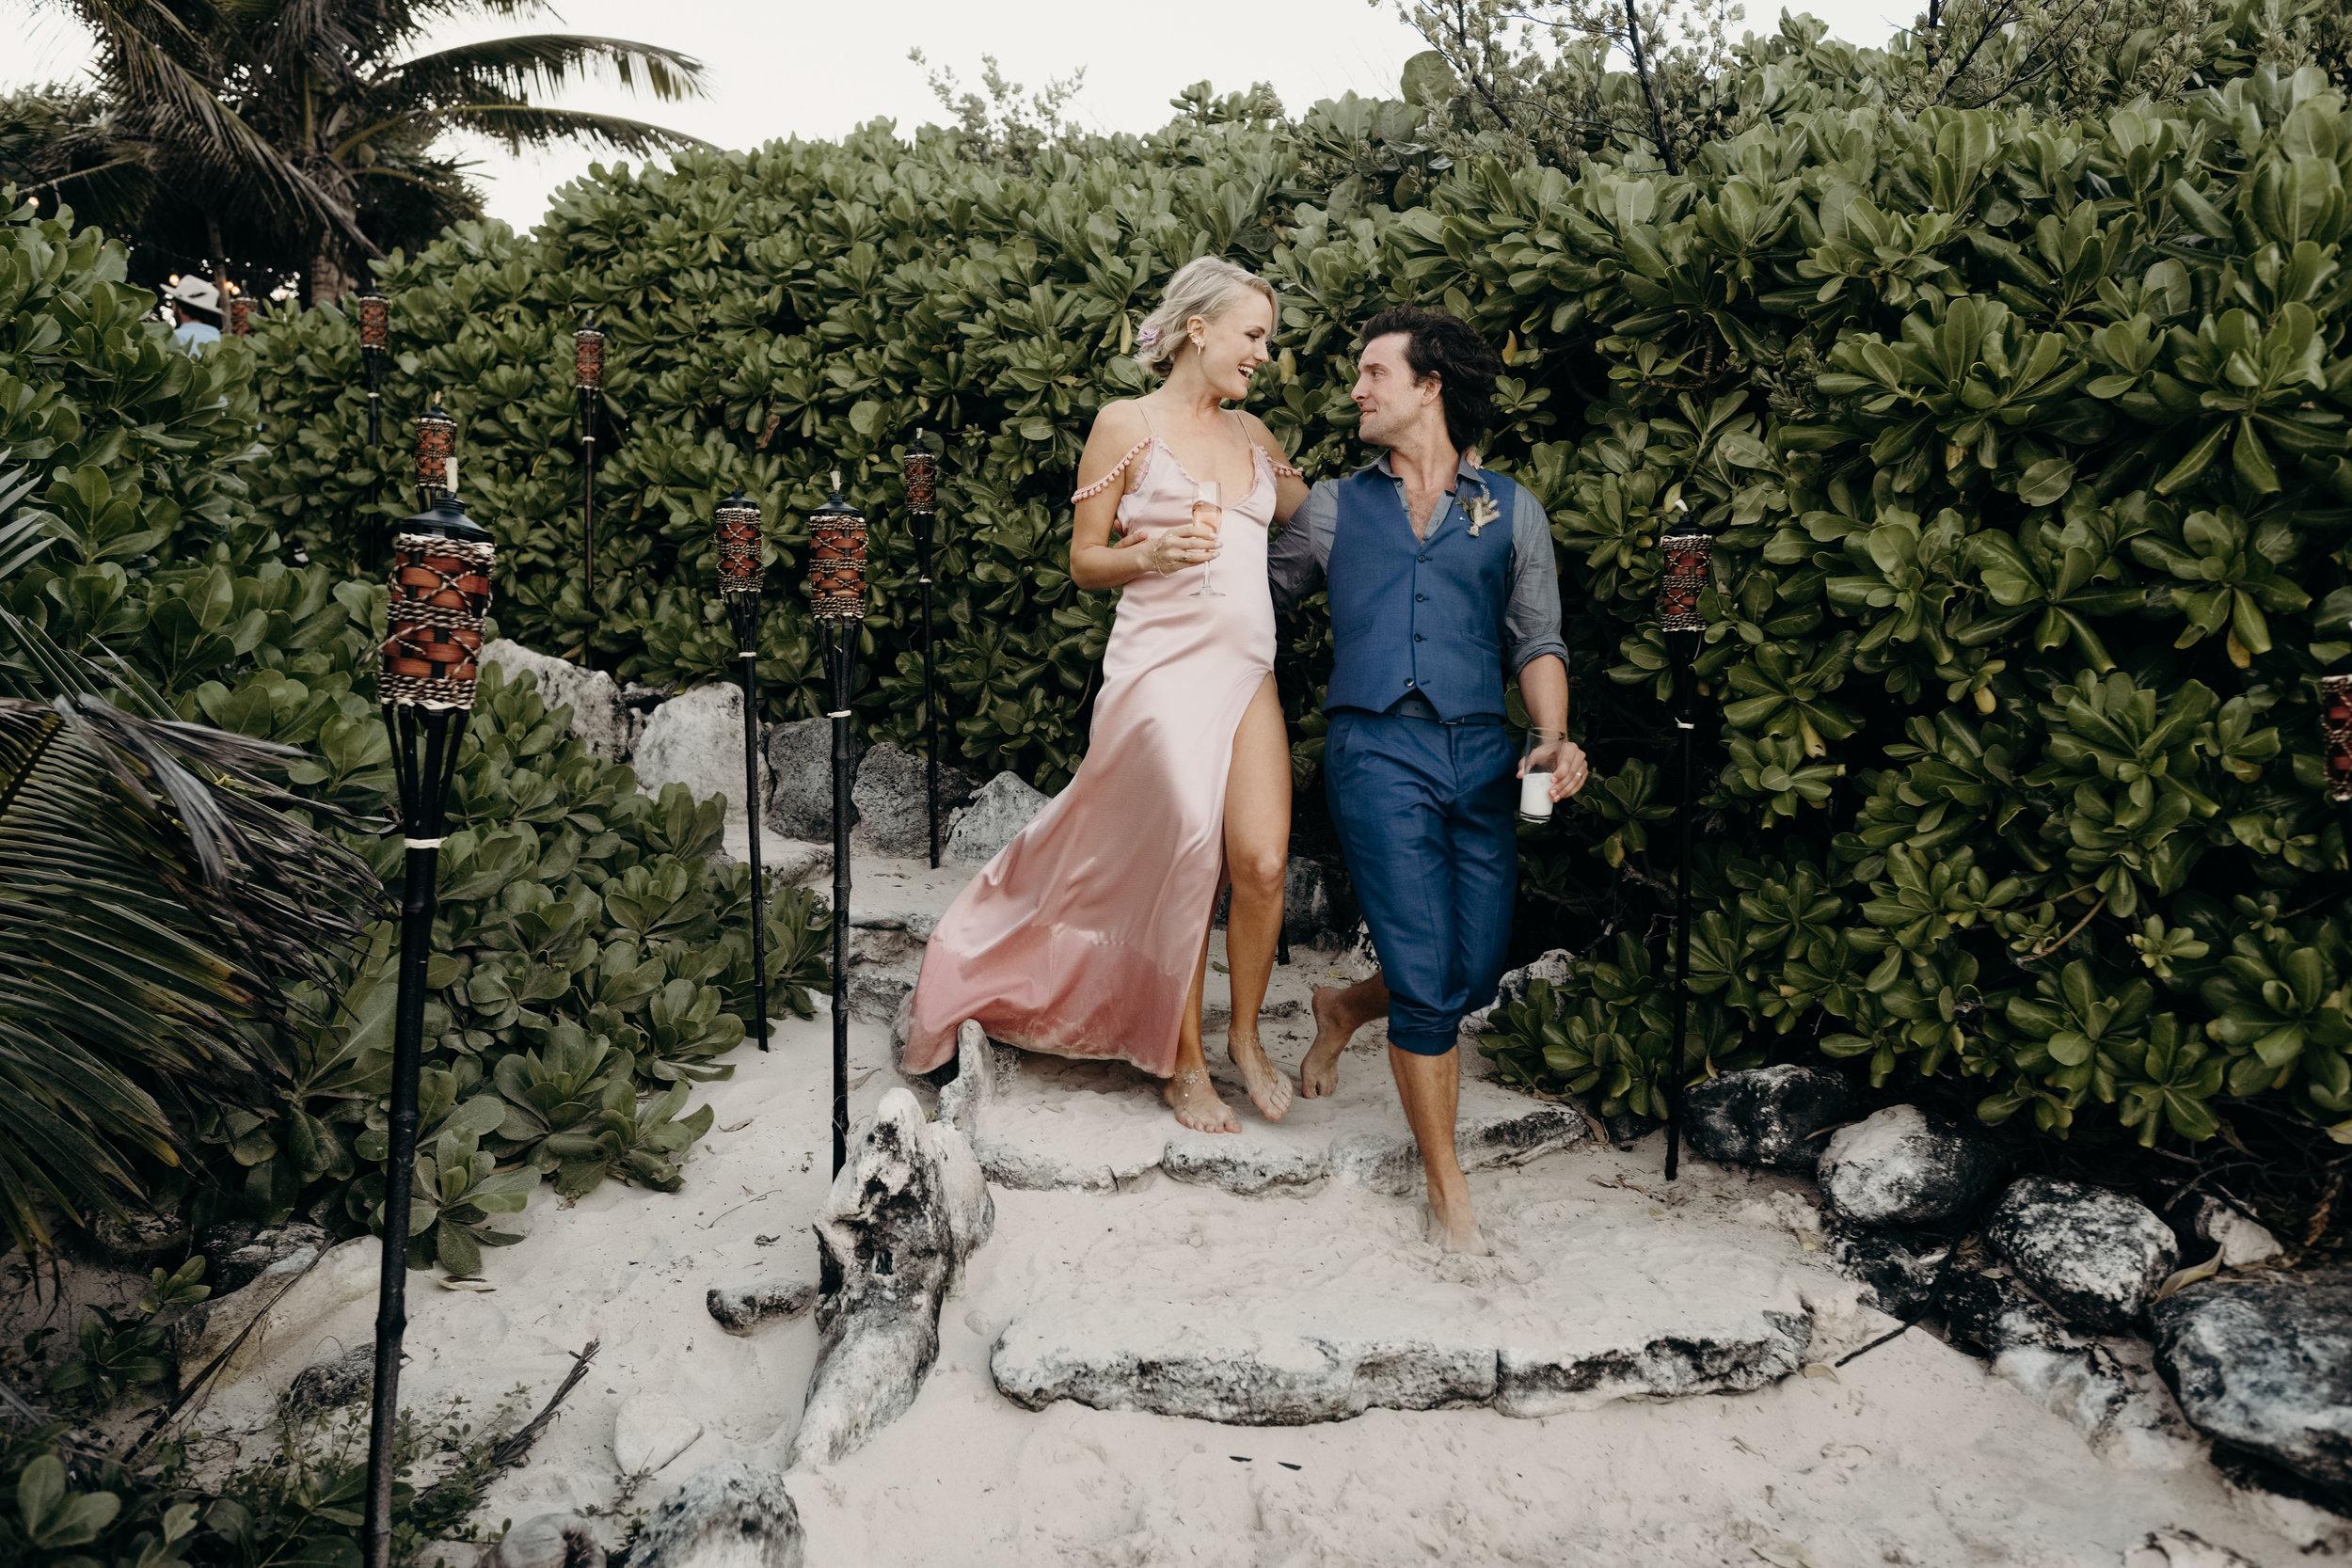 Malin-Akerman-Wedding-Tulum-Andrea-Freeman-Events-13.JPG